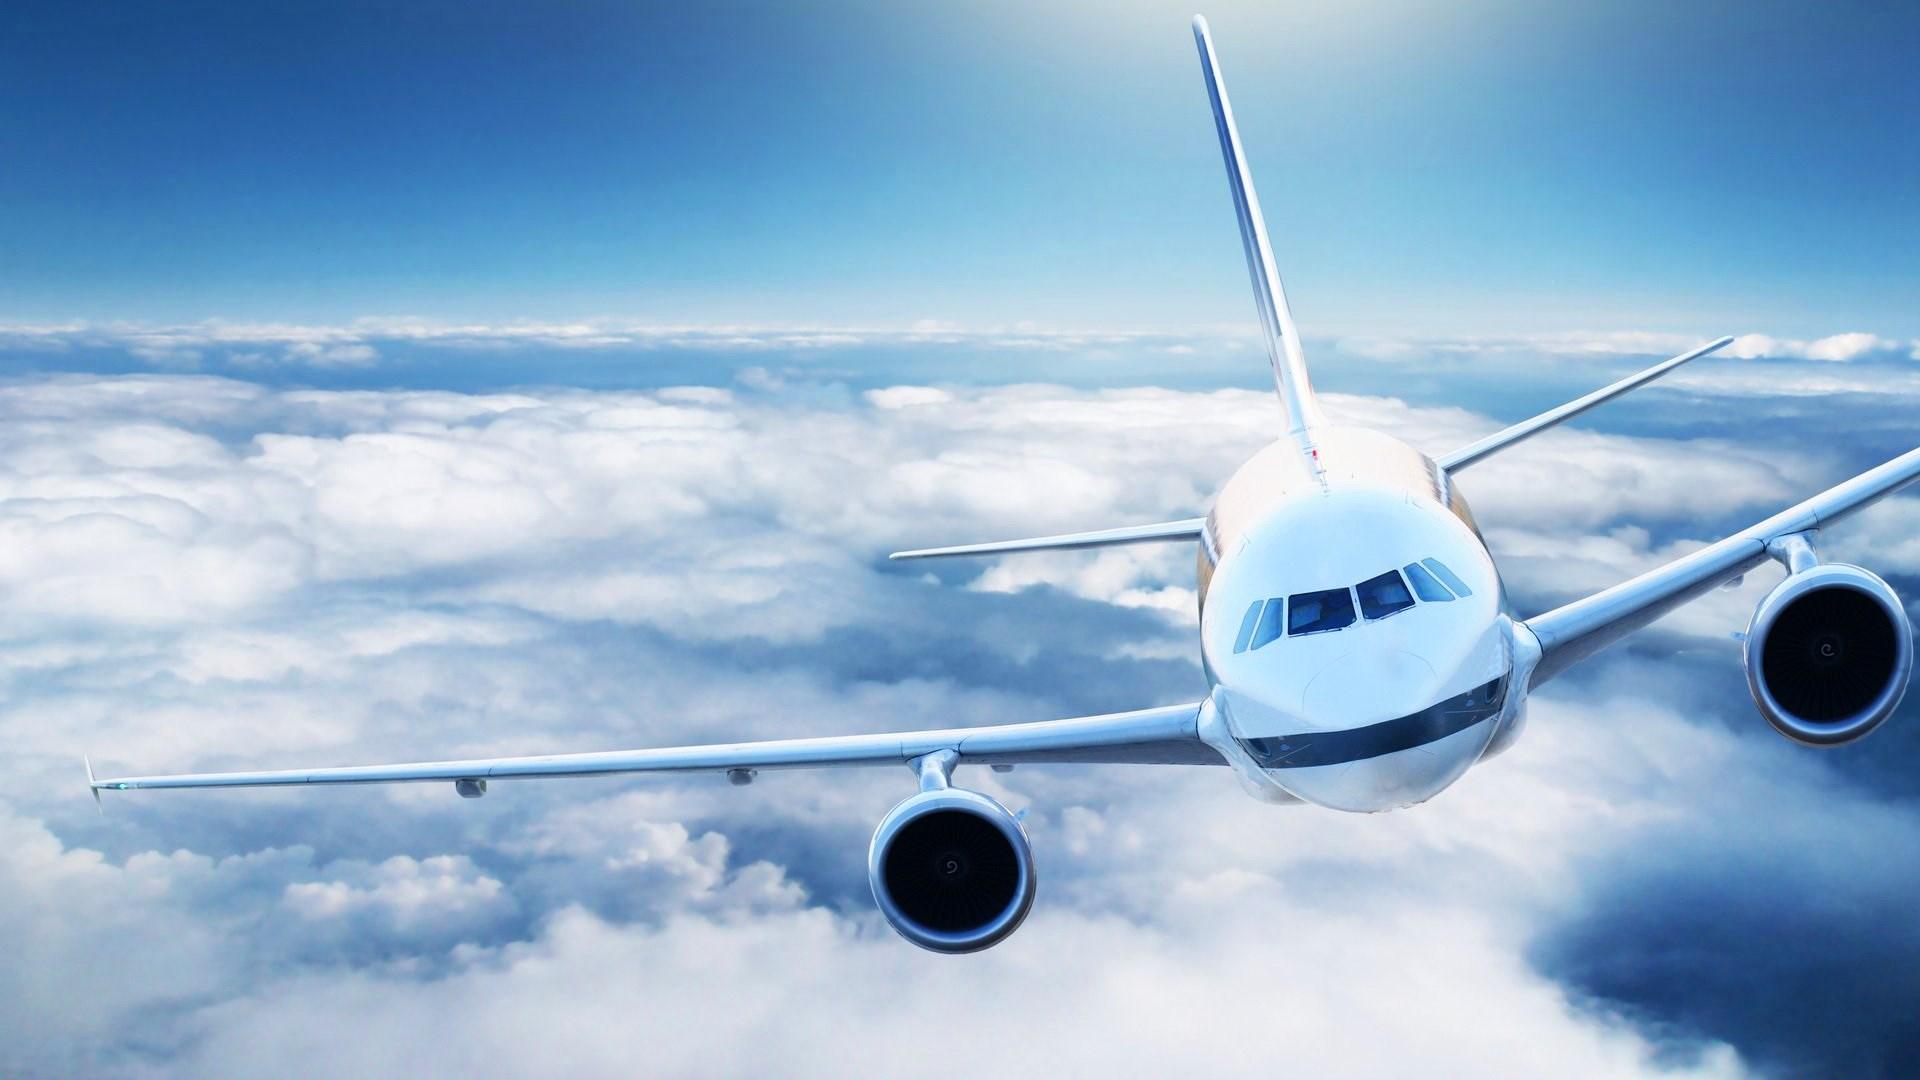 apps.14723.14101798733668136.93dc91f9 8a45 4a62 a839 a1ea11b6ee8b - Евтини самолетни екскурзии